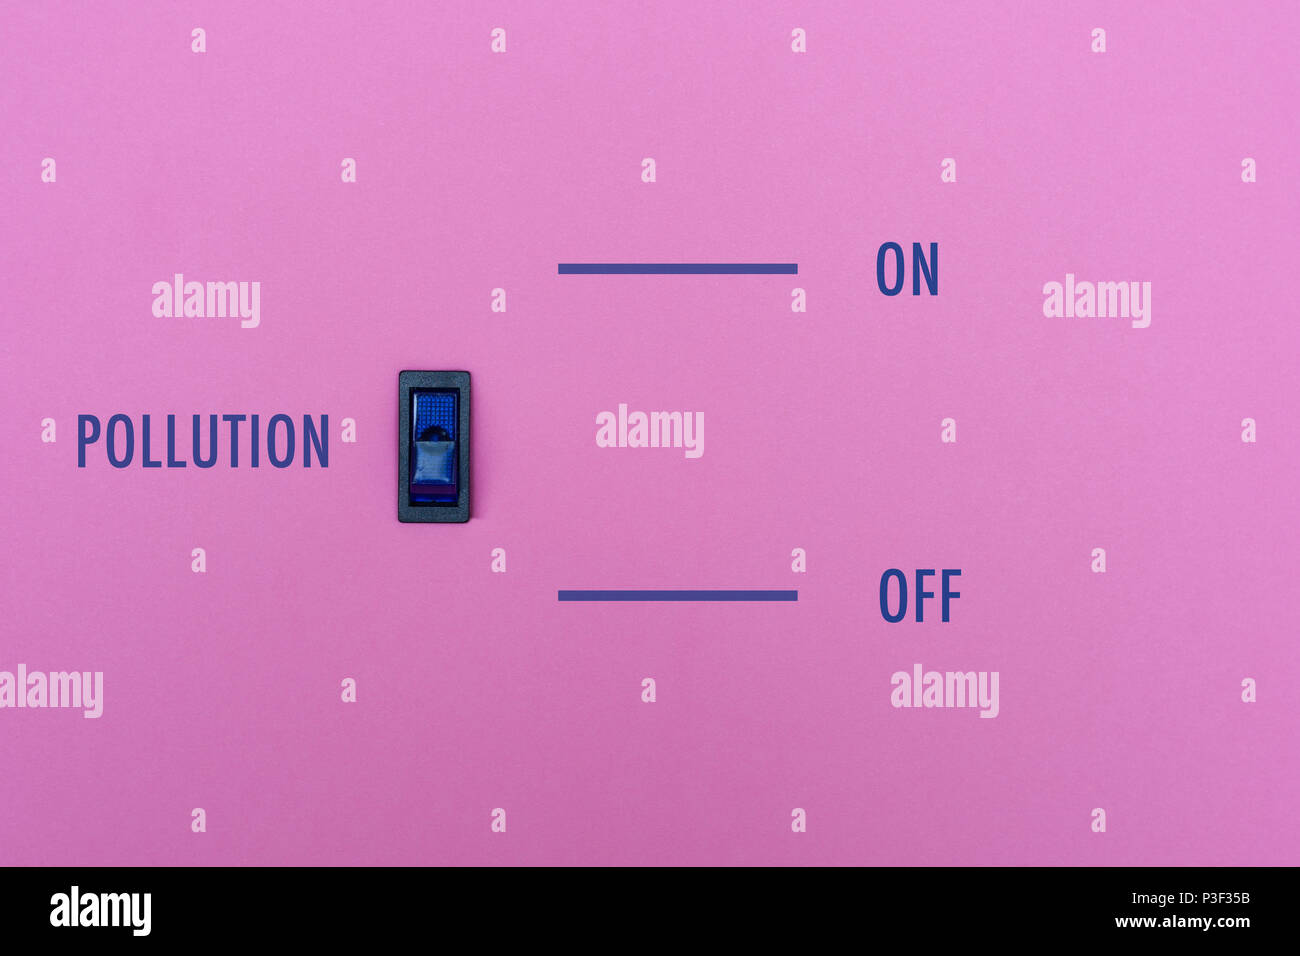 Switch On Off Symbol Stockfotos & Switch On Off Symbol Bilder ...